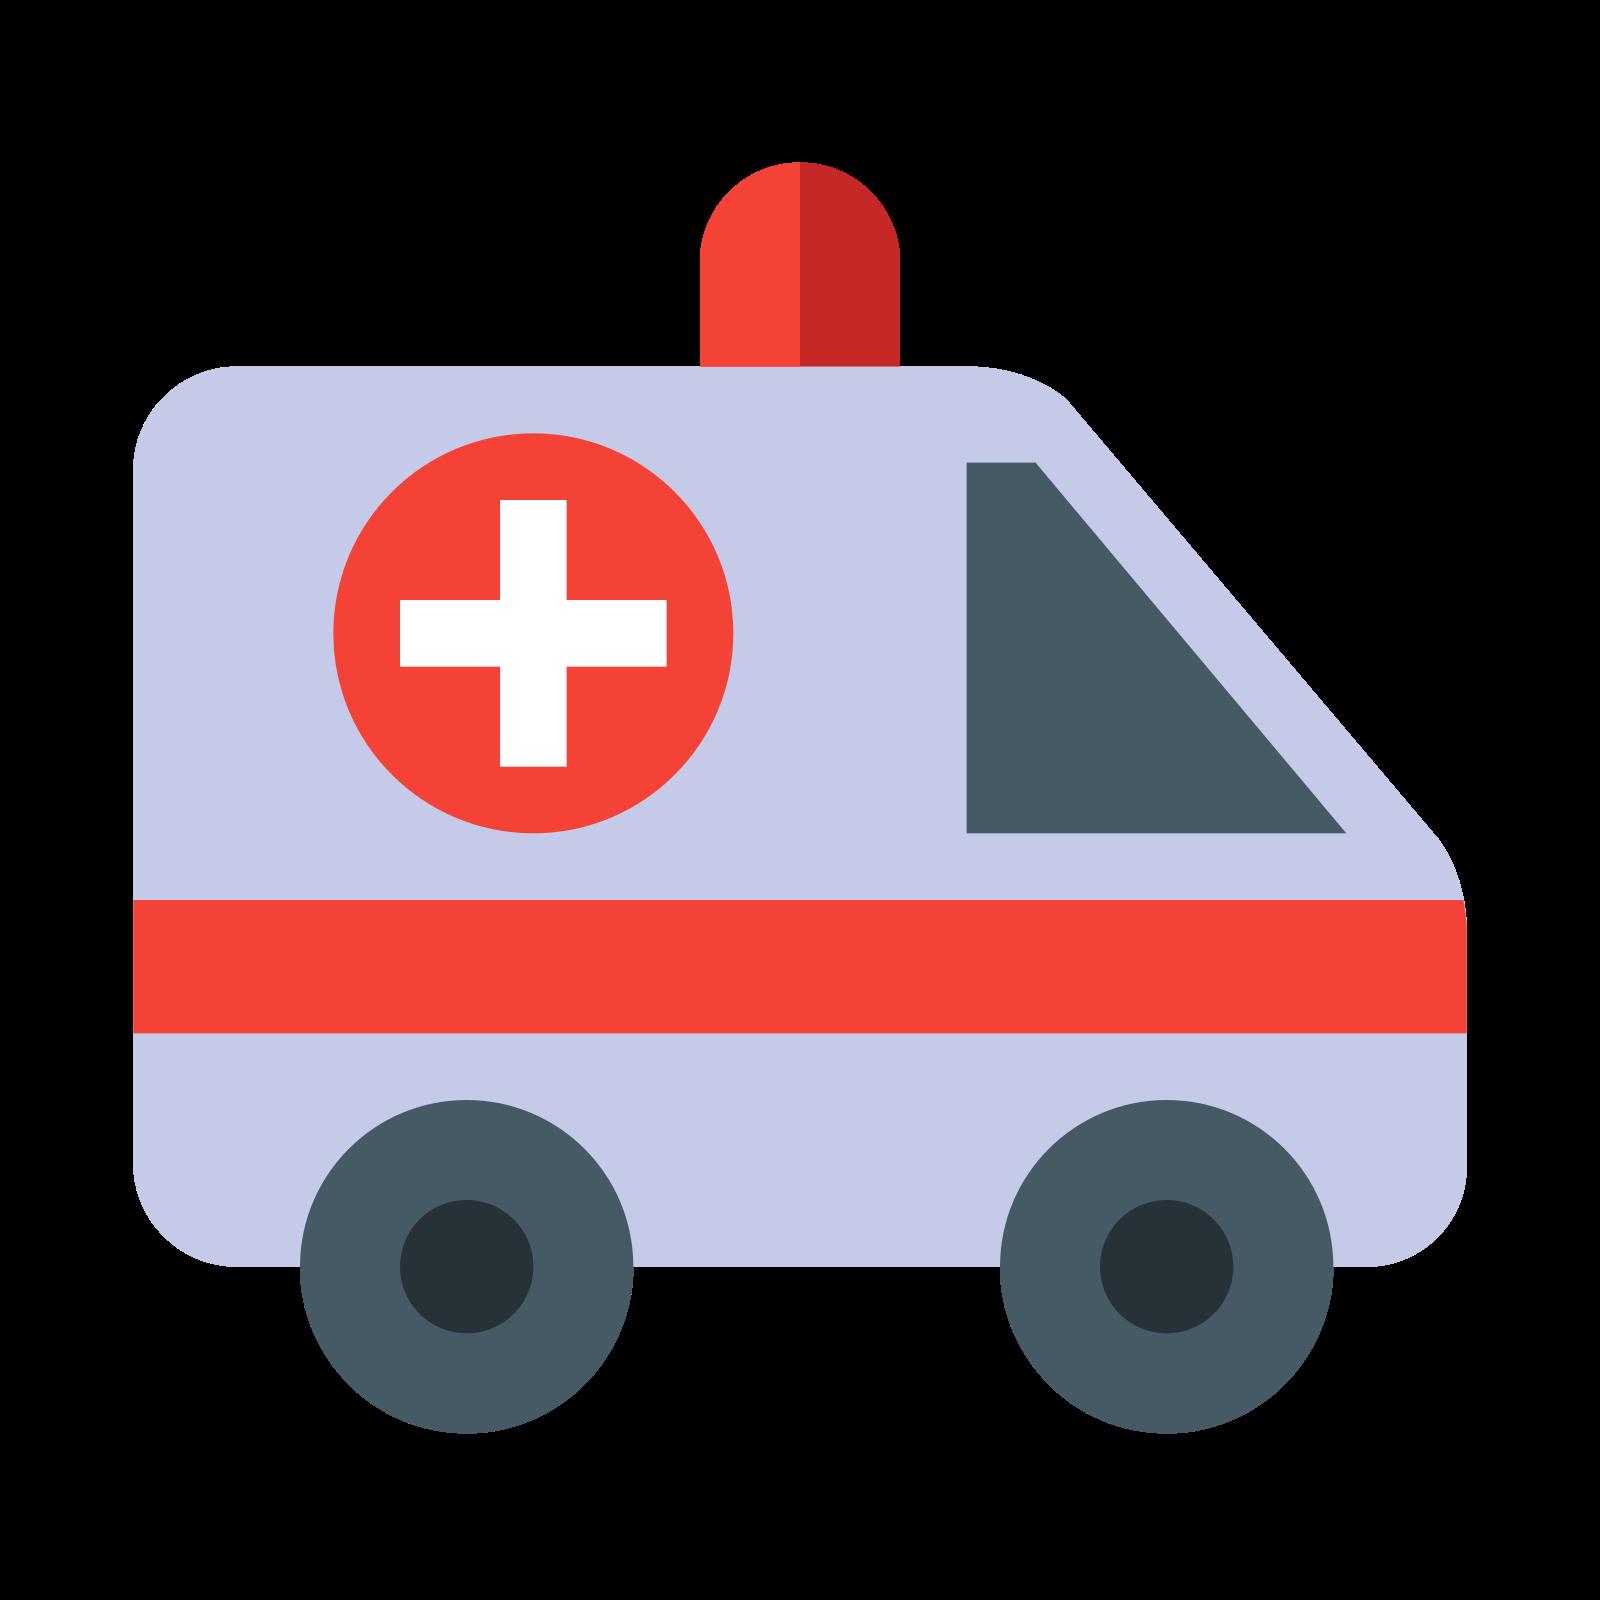 Emergency clipart ambulance truck. Ircs to expand vehicle